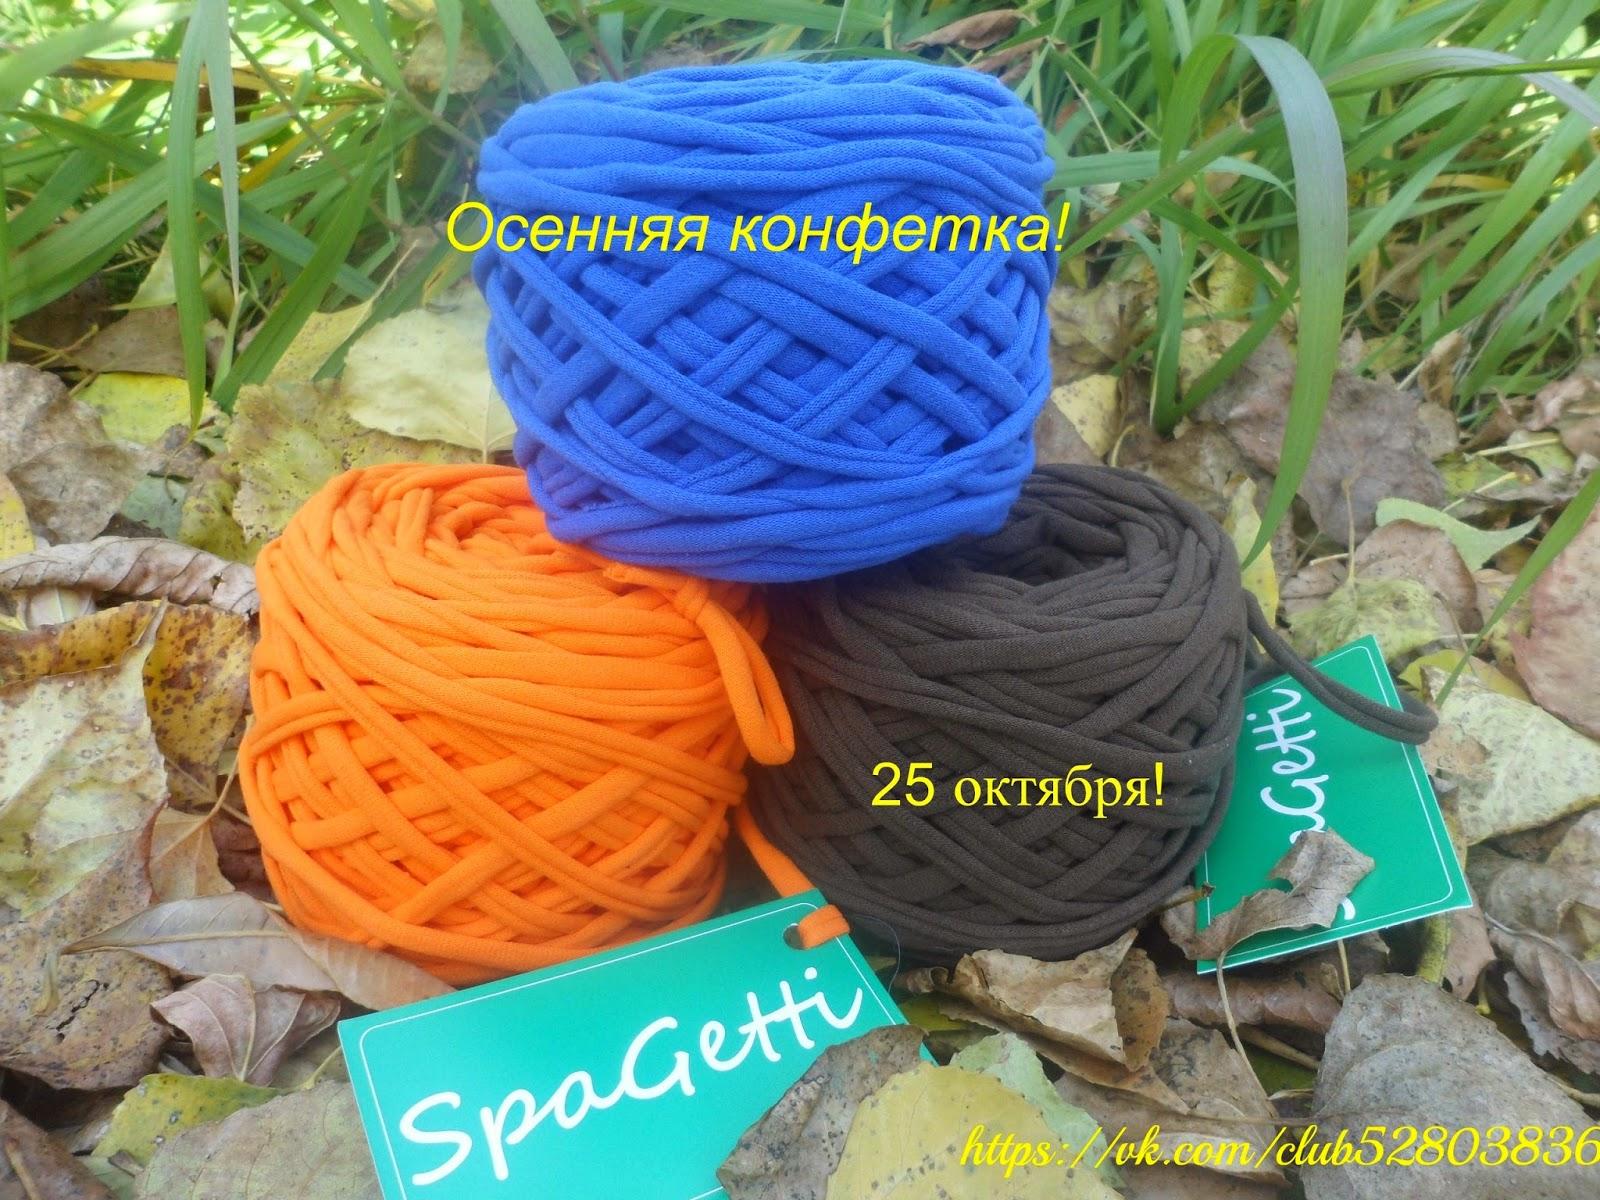 спагетти, нить спагетти ,спагетти в Красноярске, SpaGetti в Красноярске, SpaGetti